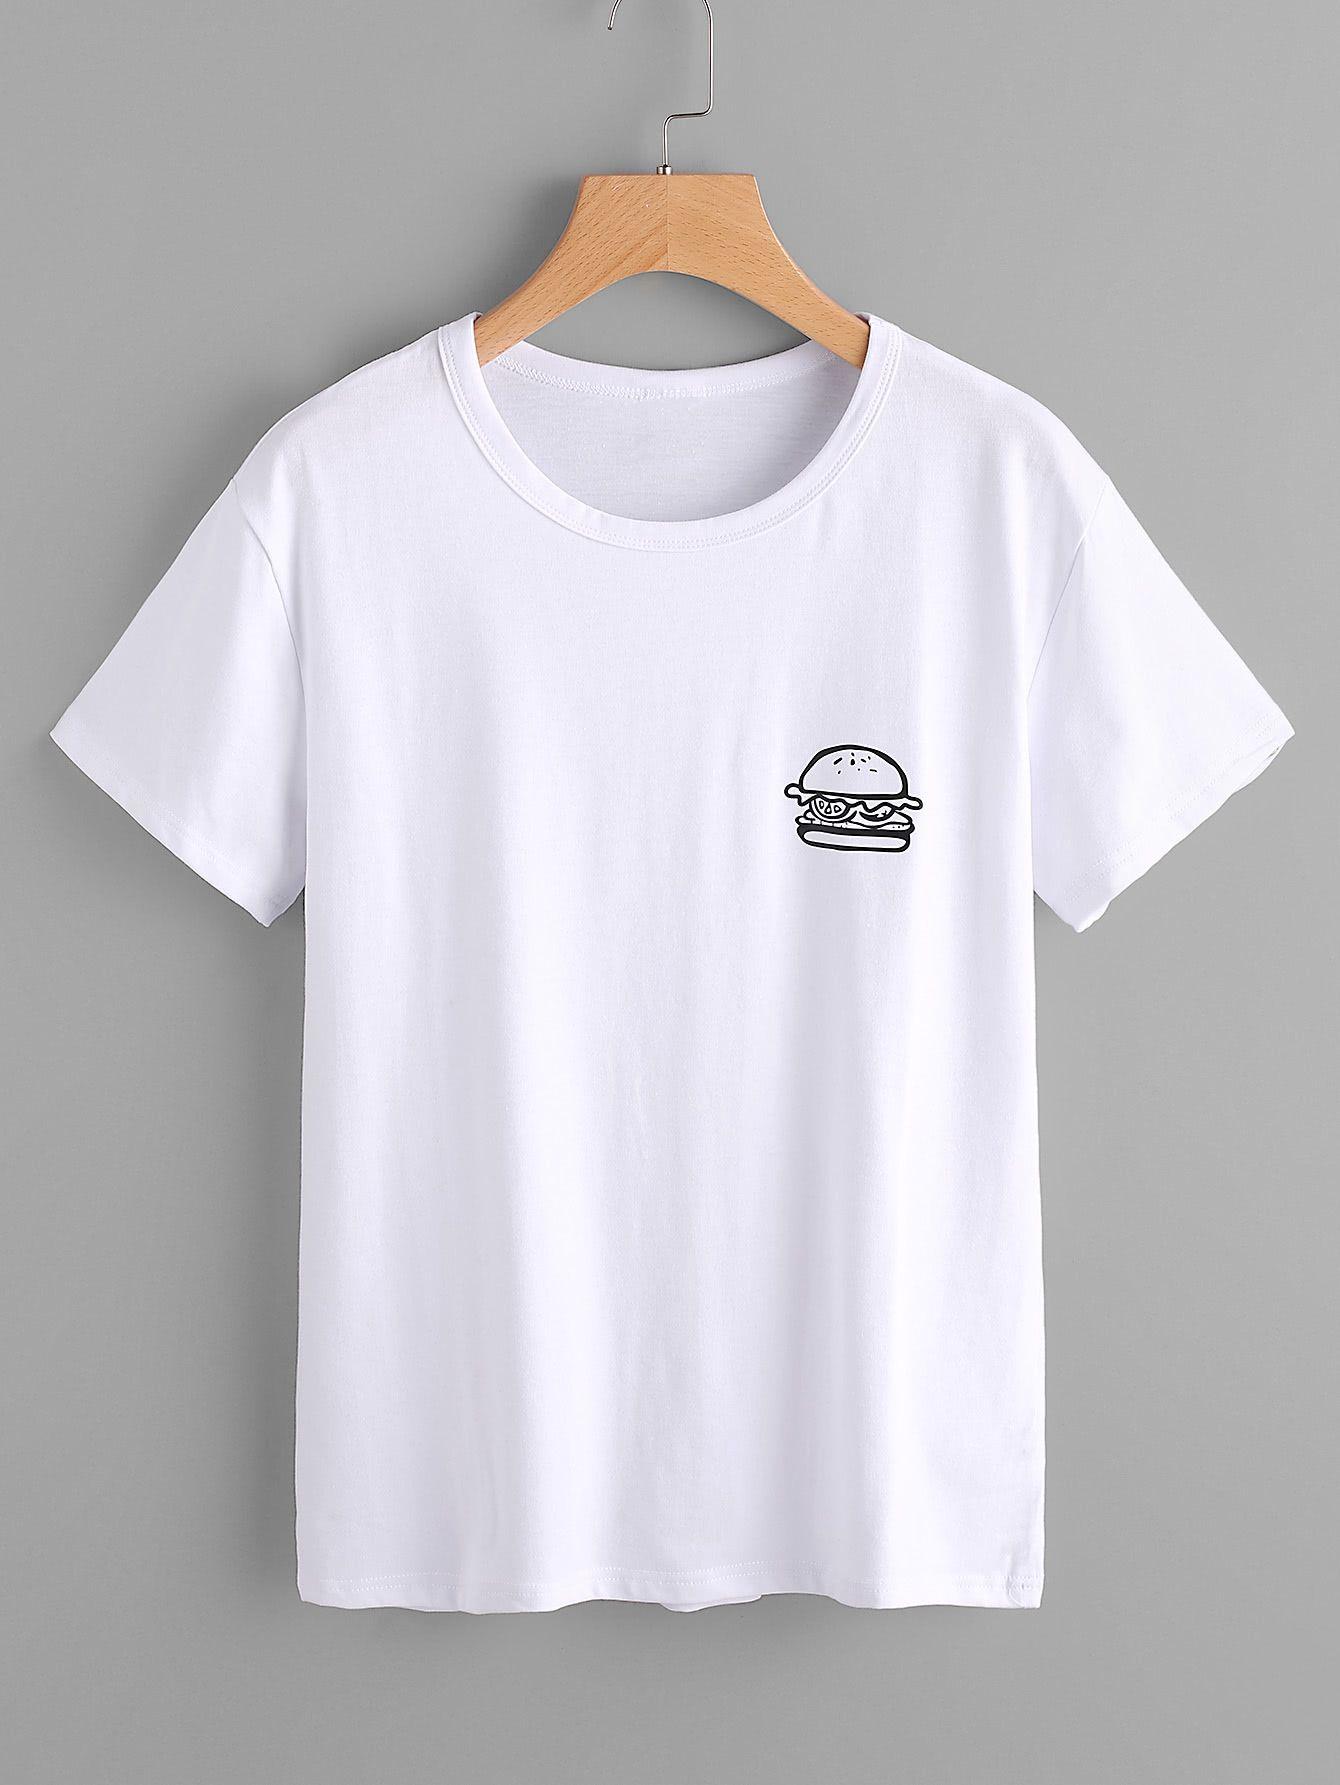 online store e1841 7a433 Shop Hamburger Print Tshirt online. SheIn offers Hamburger ...